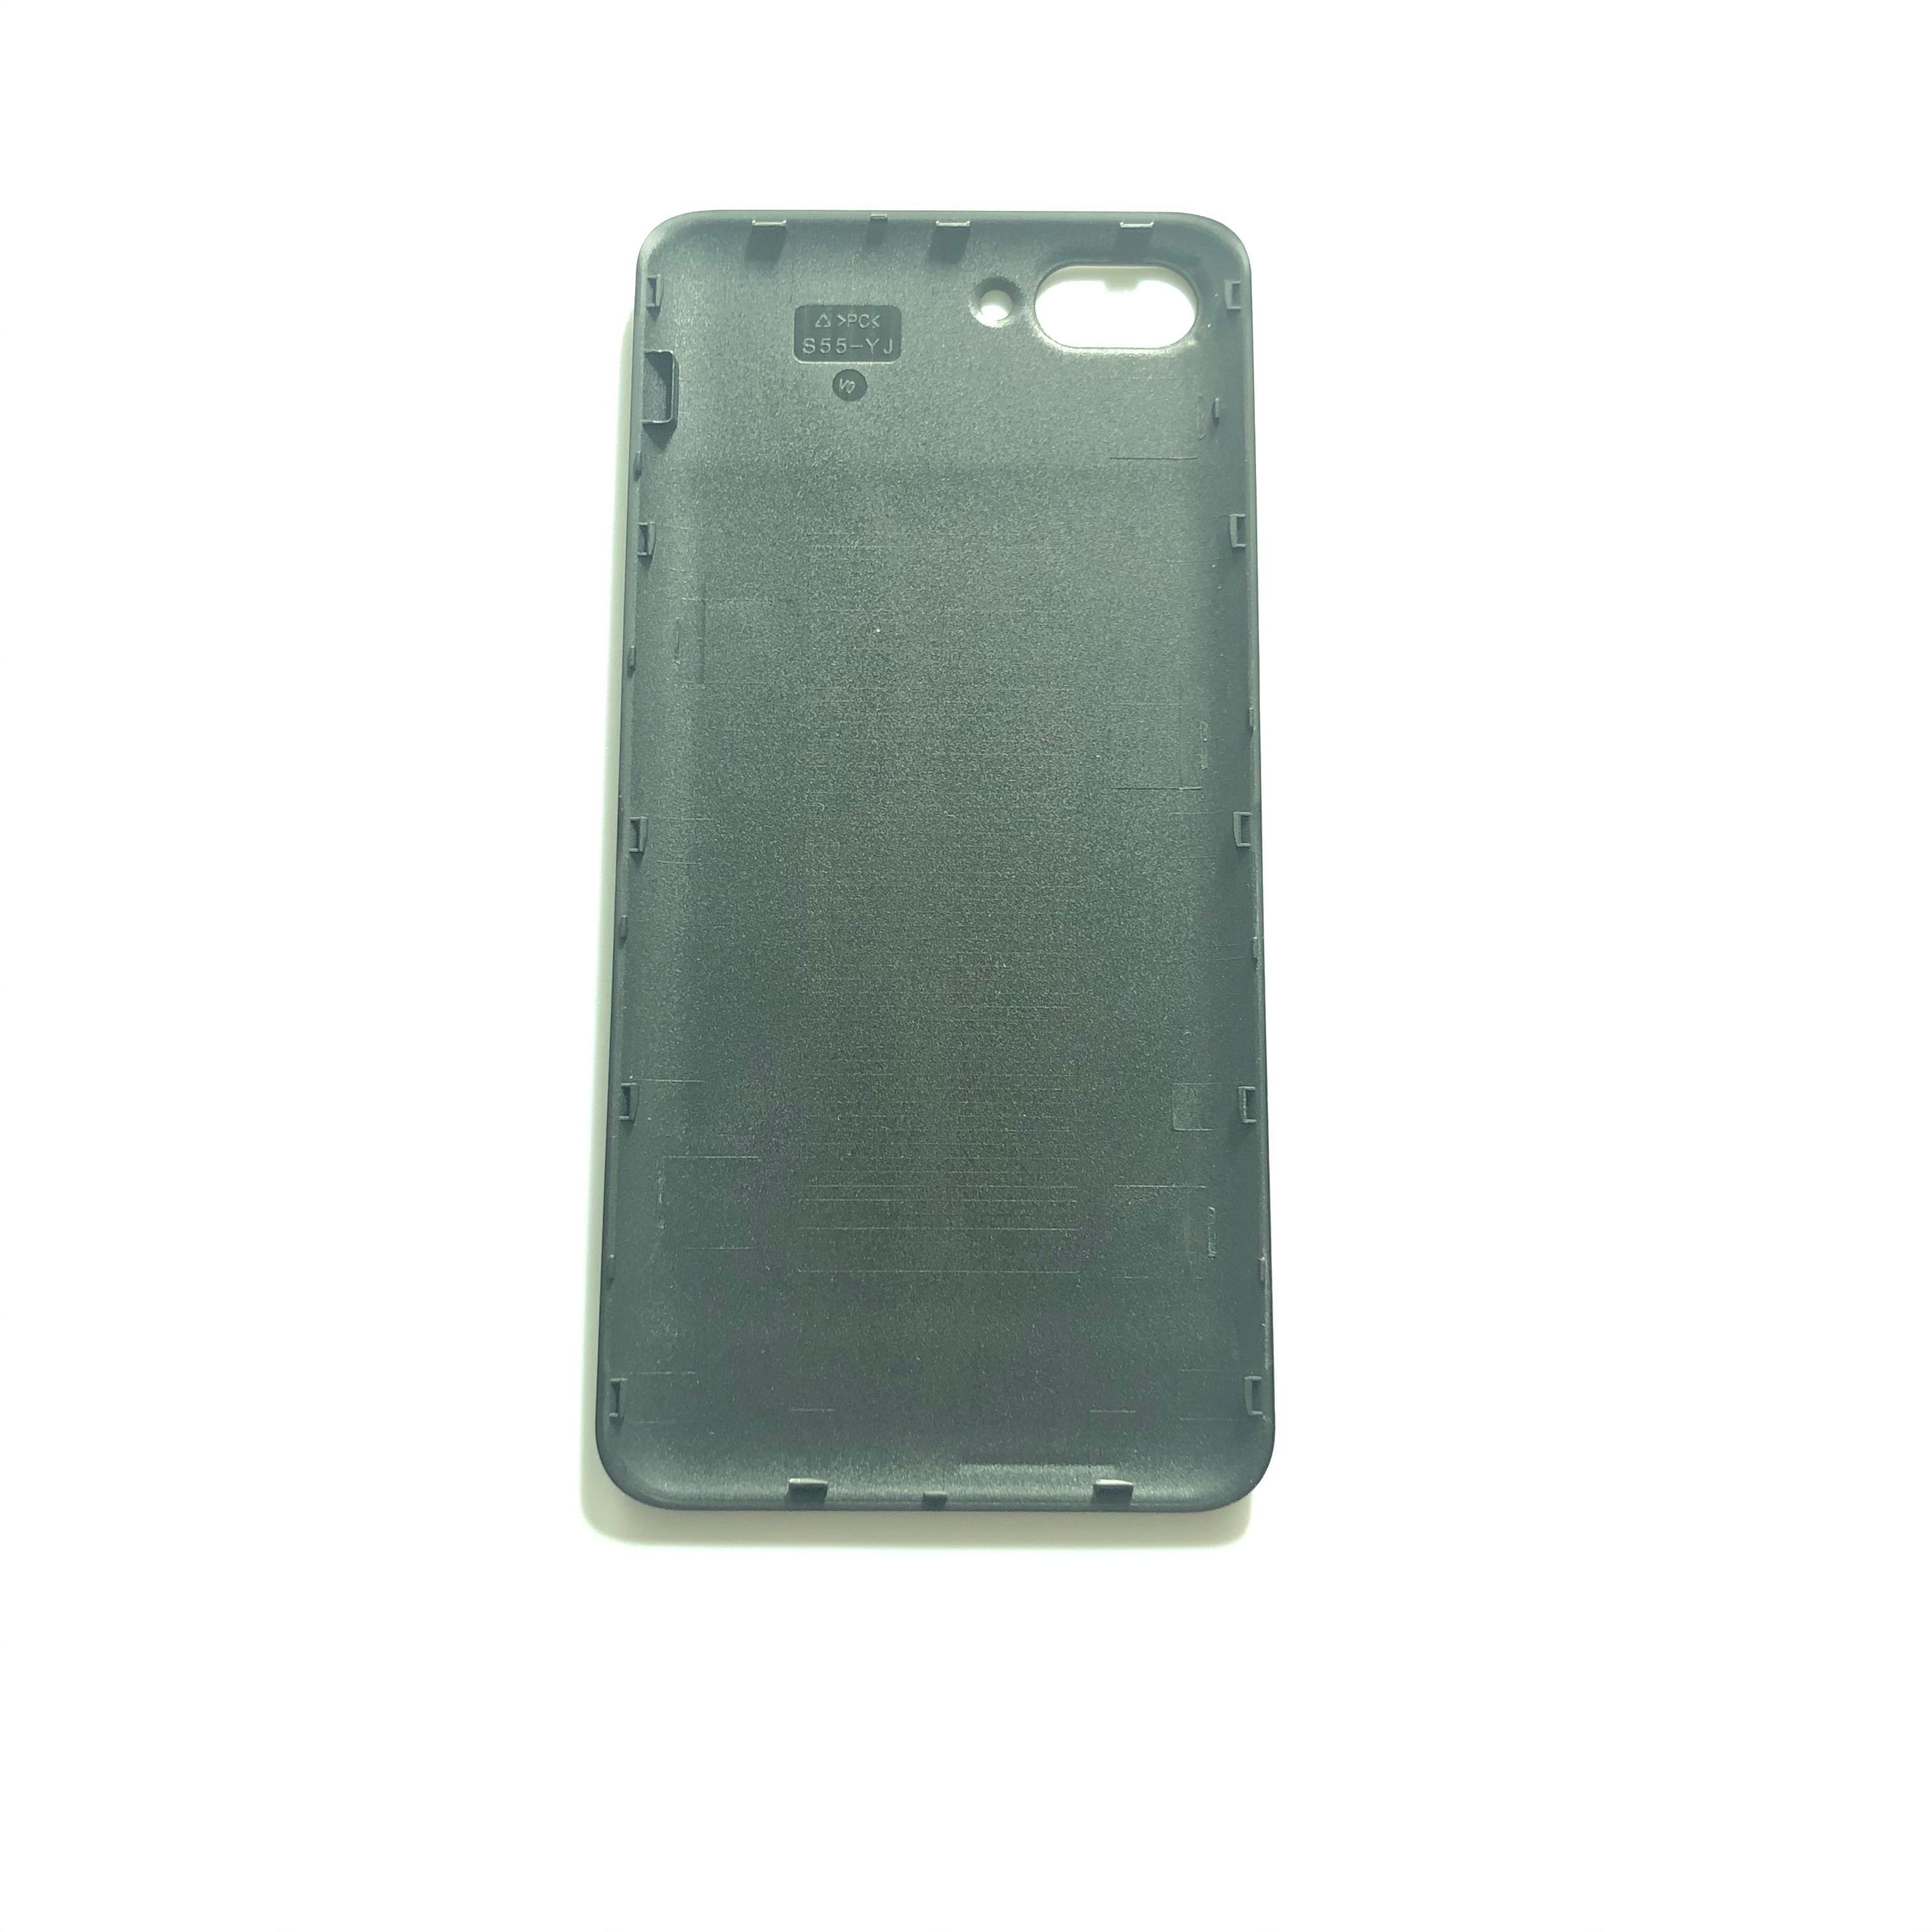 Oukitel C11 Used Protective Battery Case Cover Back Shell For Oukitel C11 MediaTek MT6737 5.45